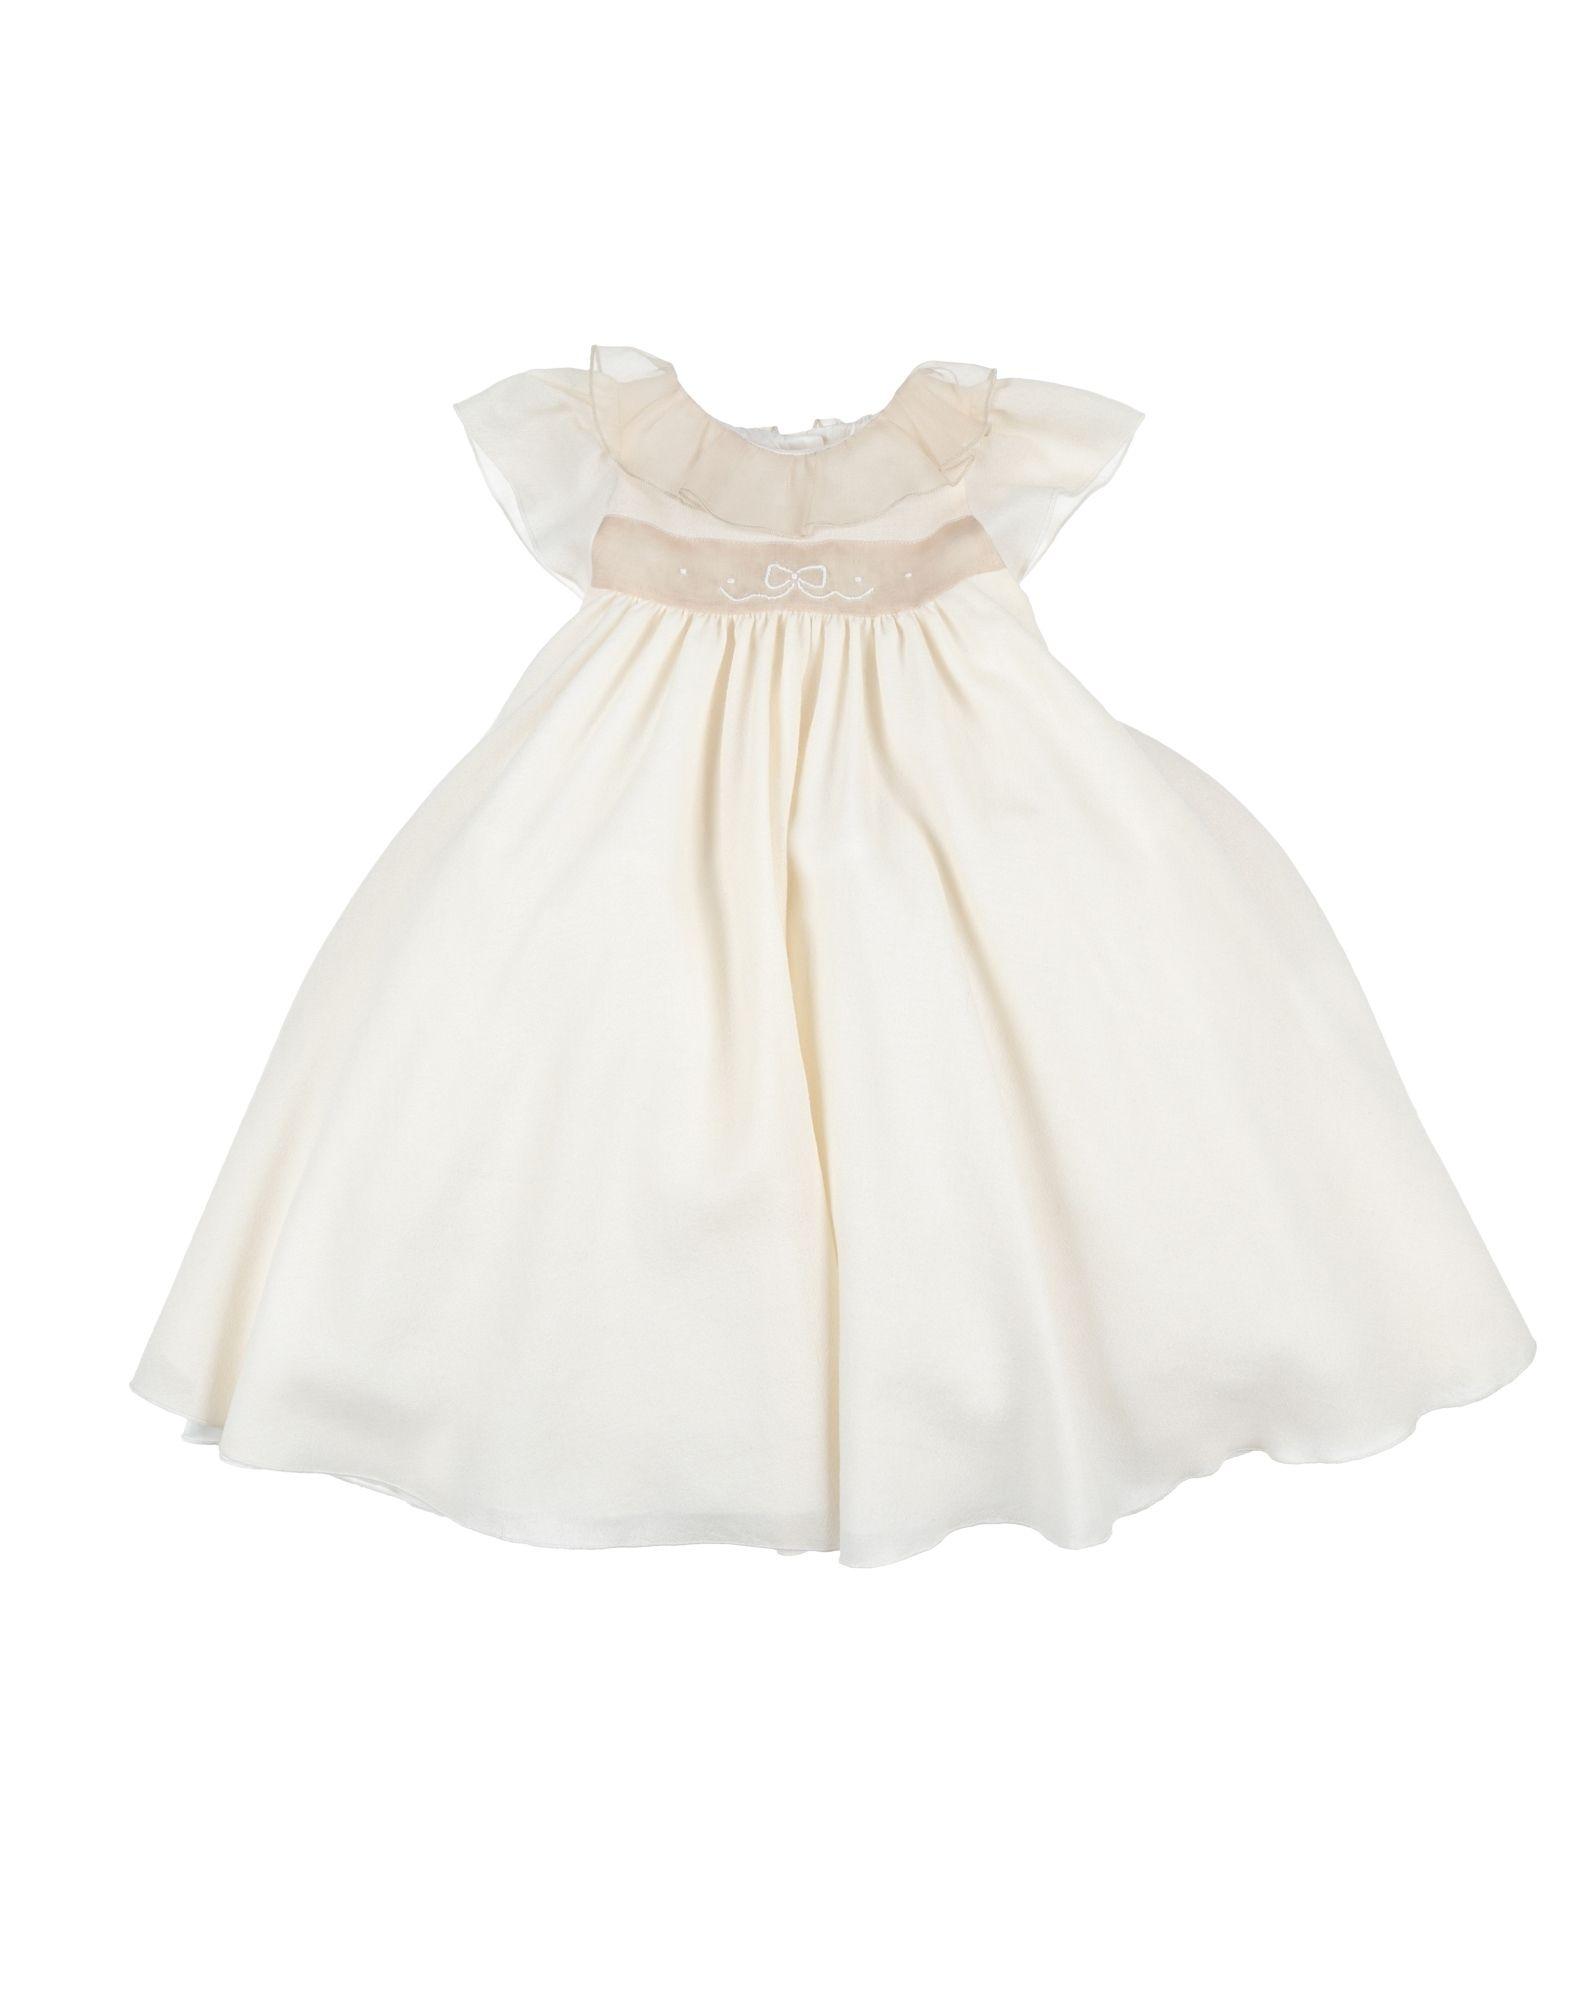 LA STUPENDERIA Dress in Ivory